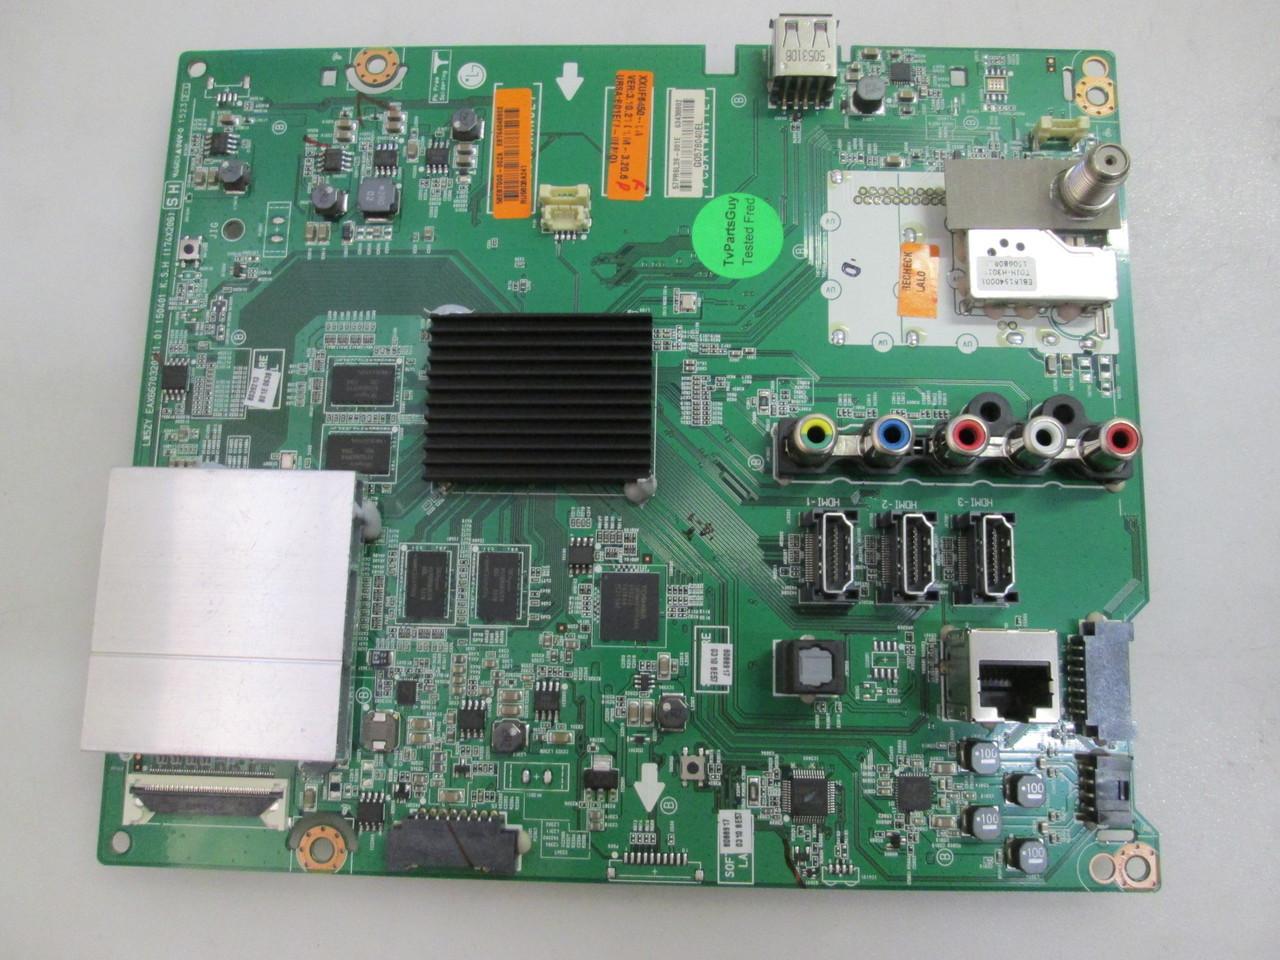 lg ebt64048902 eax66703202(1 0) 55uf6450-ua main board